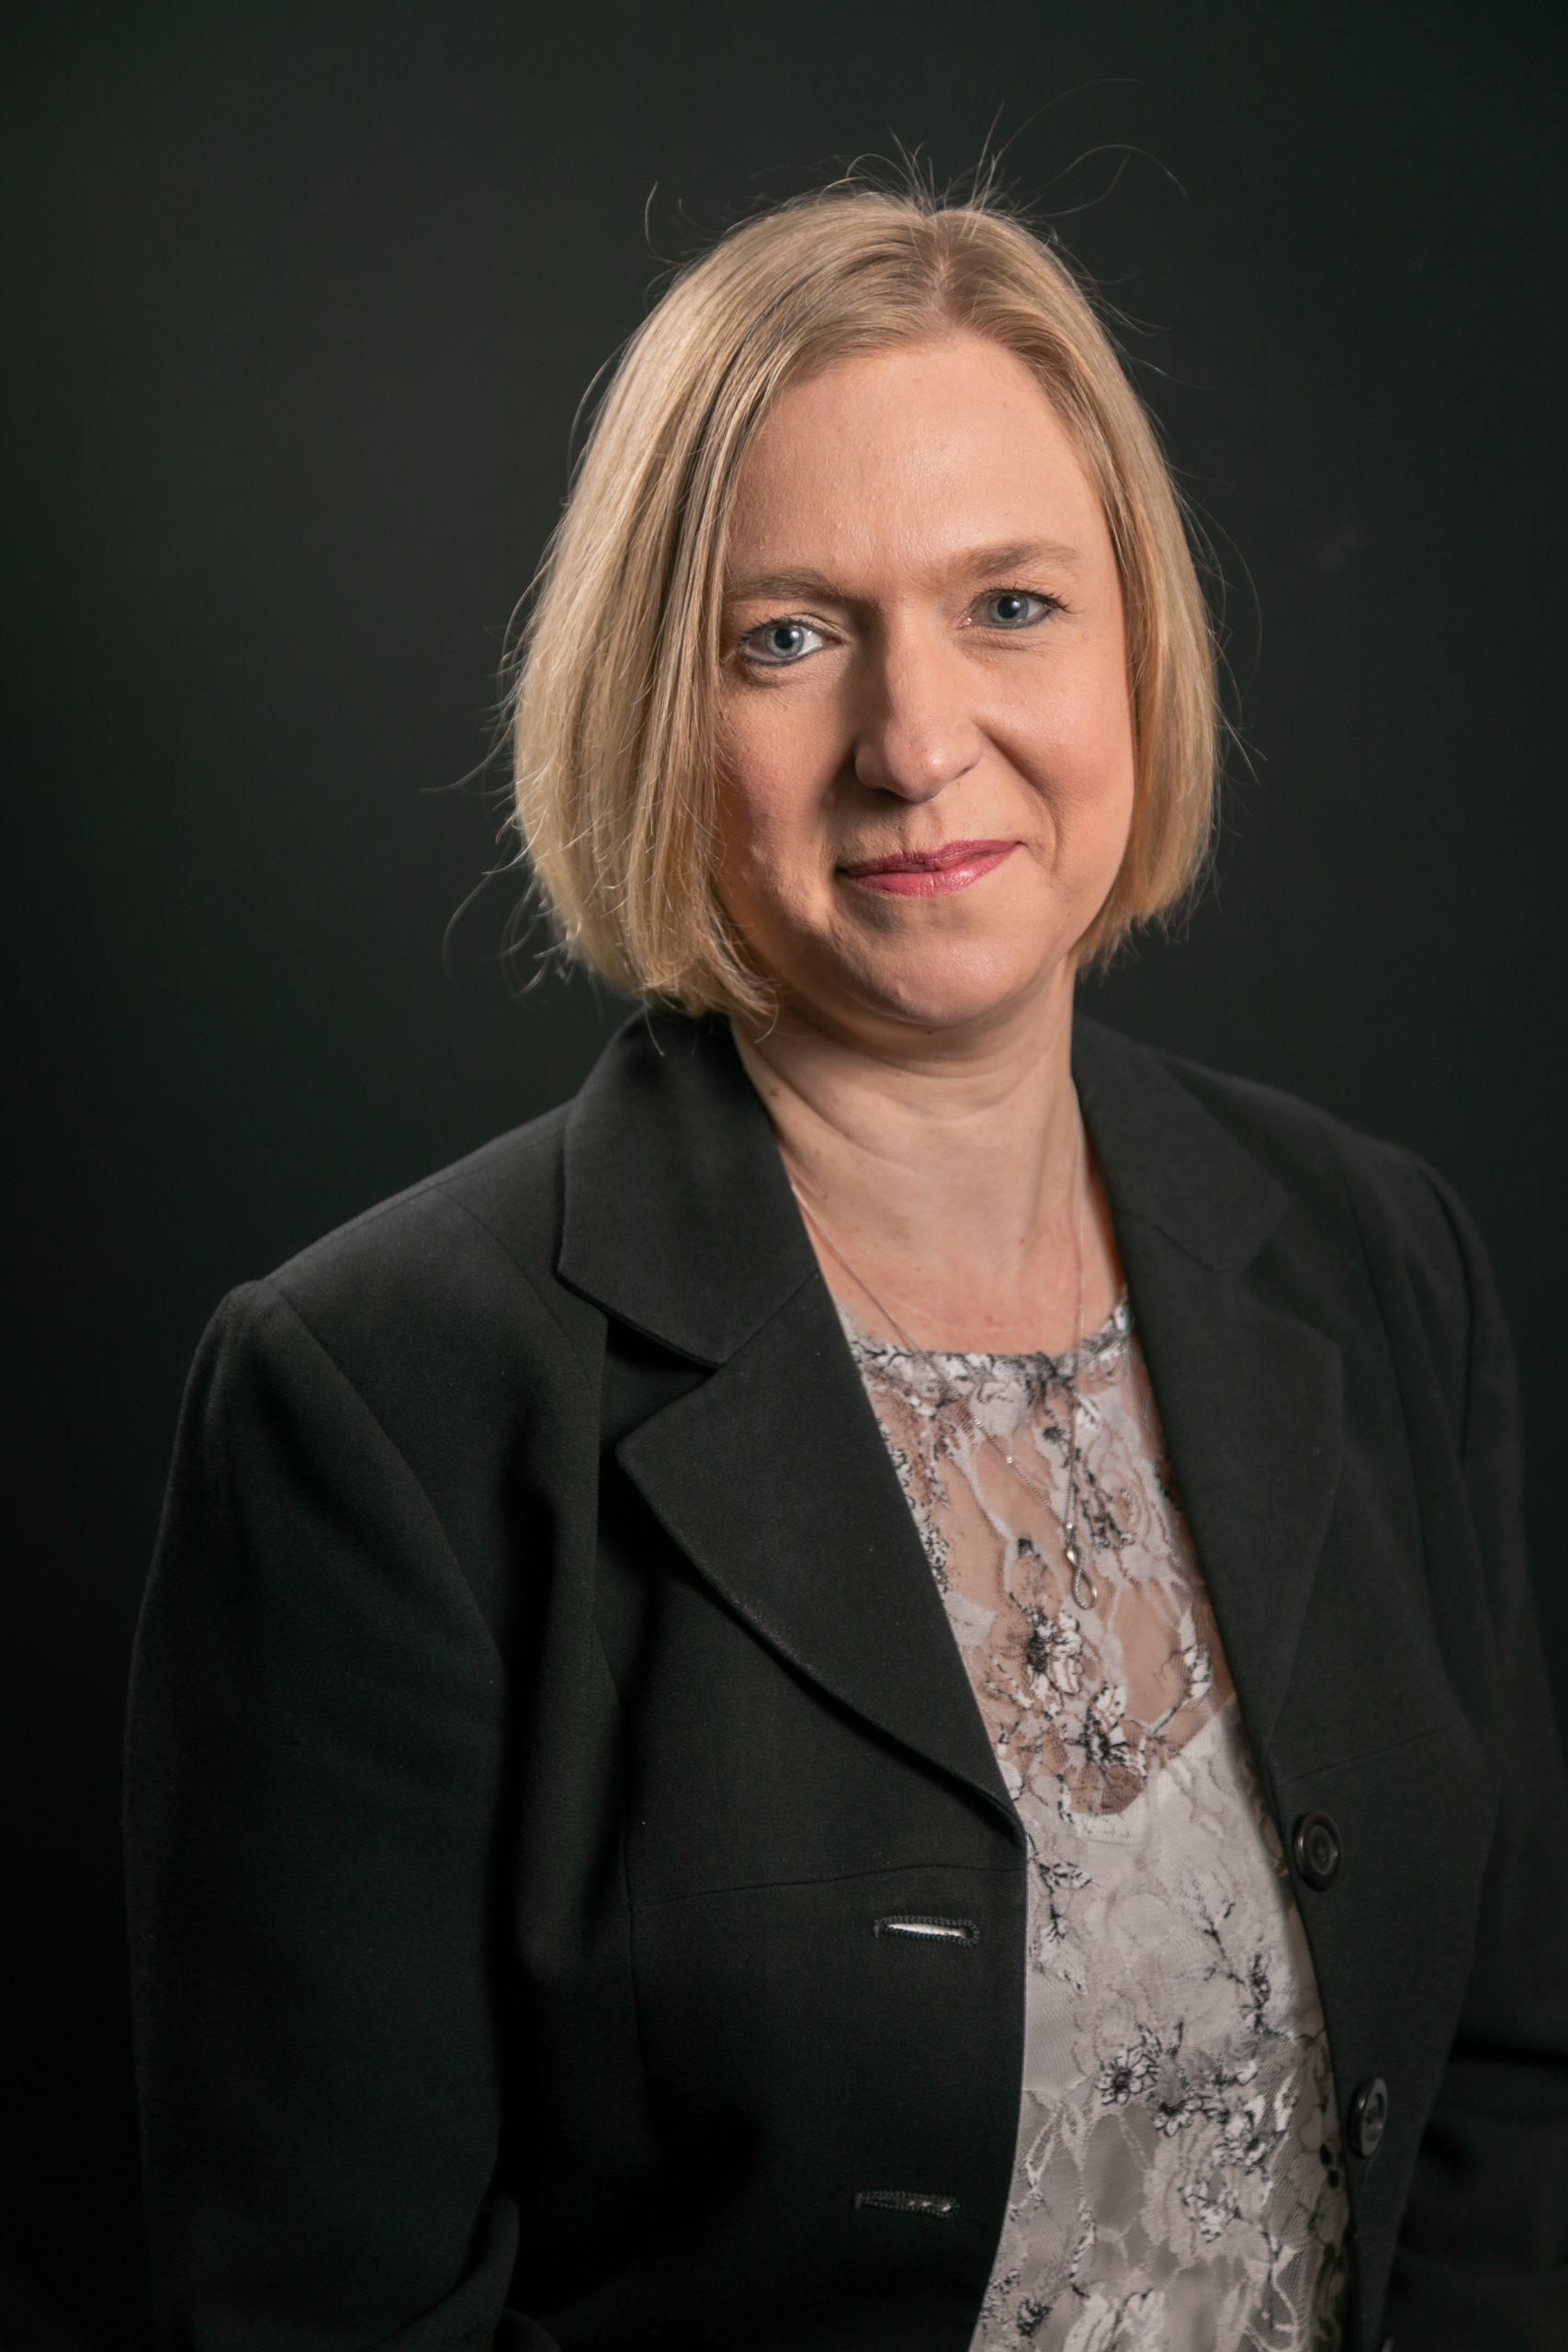 Nicolene Heydenrych